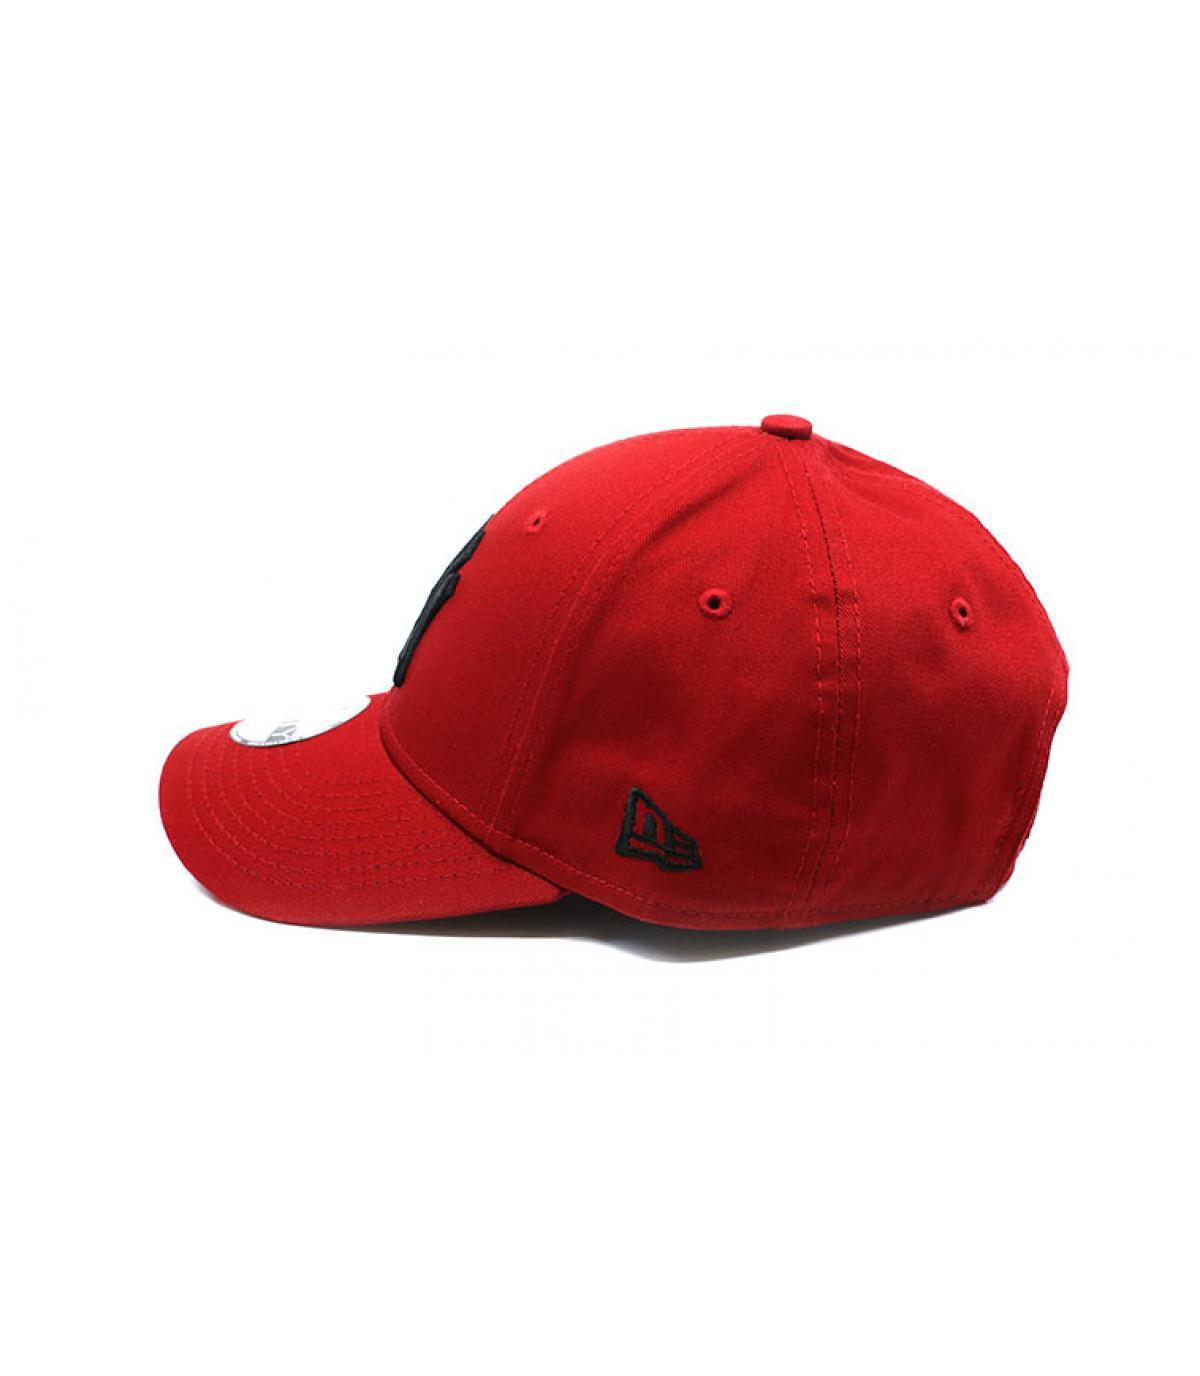 Détails League Ess NY 9Forty hot red black - image 4